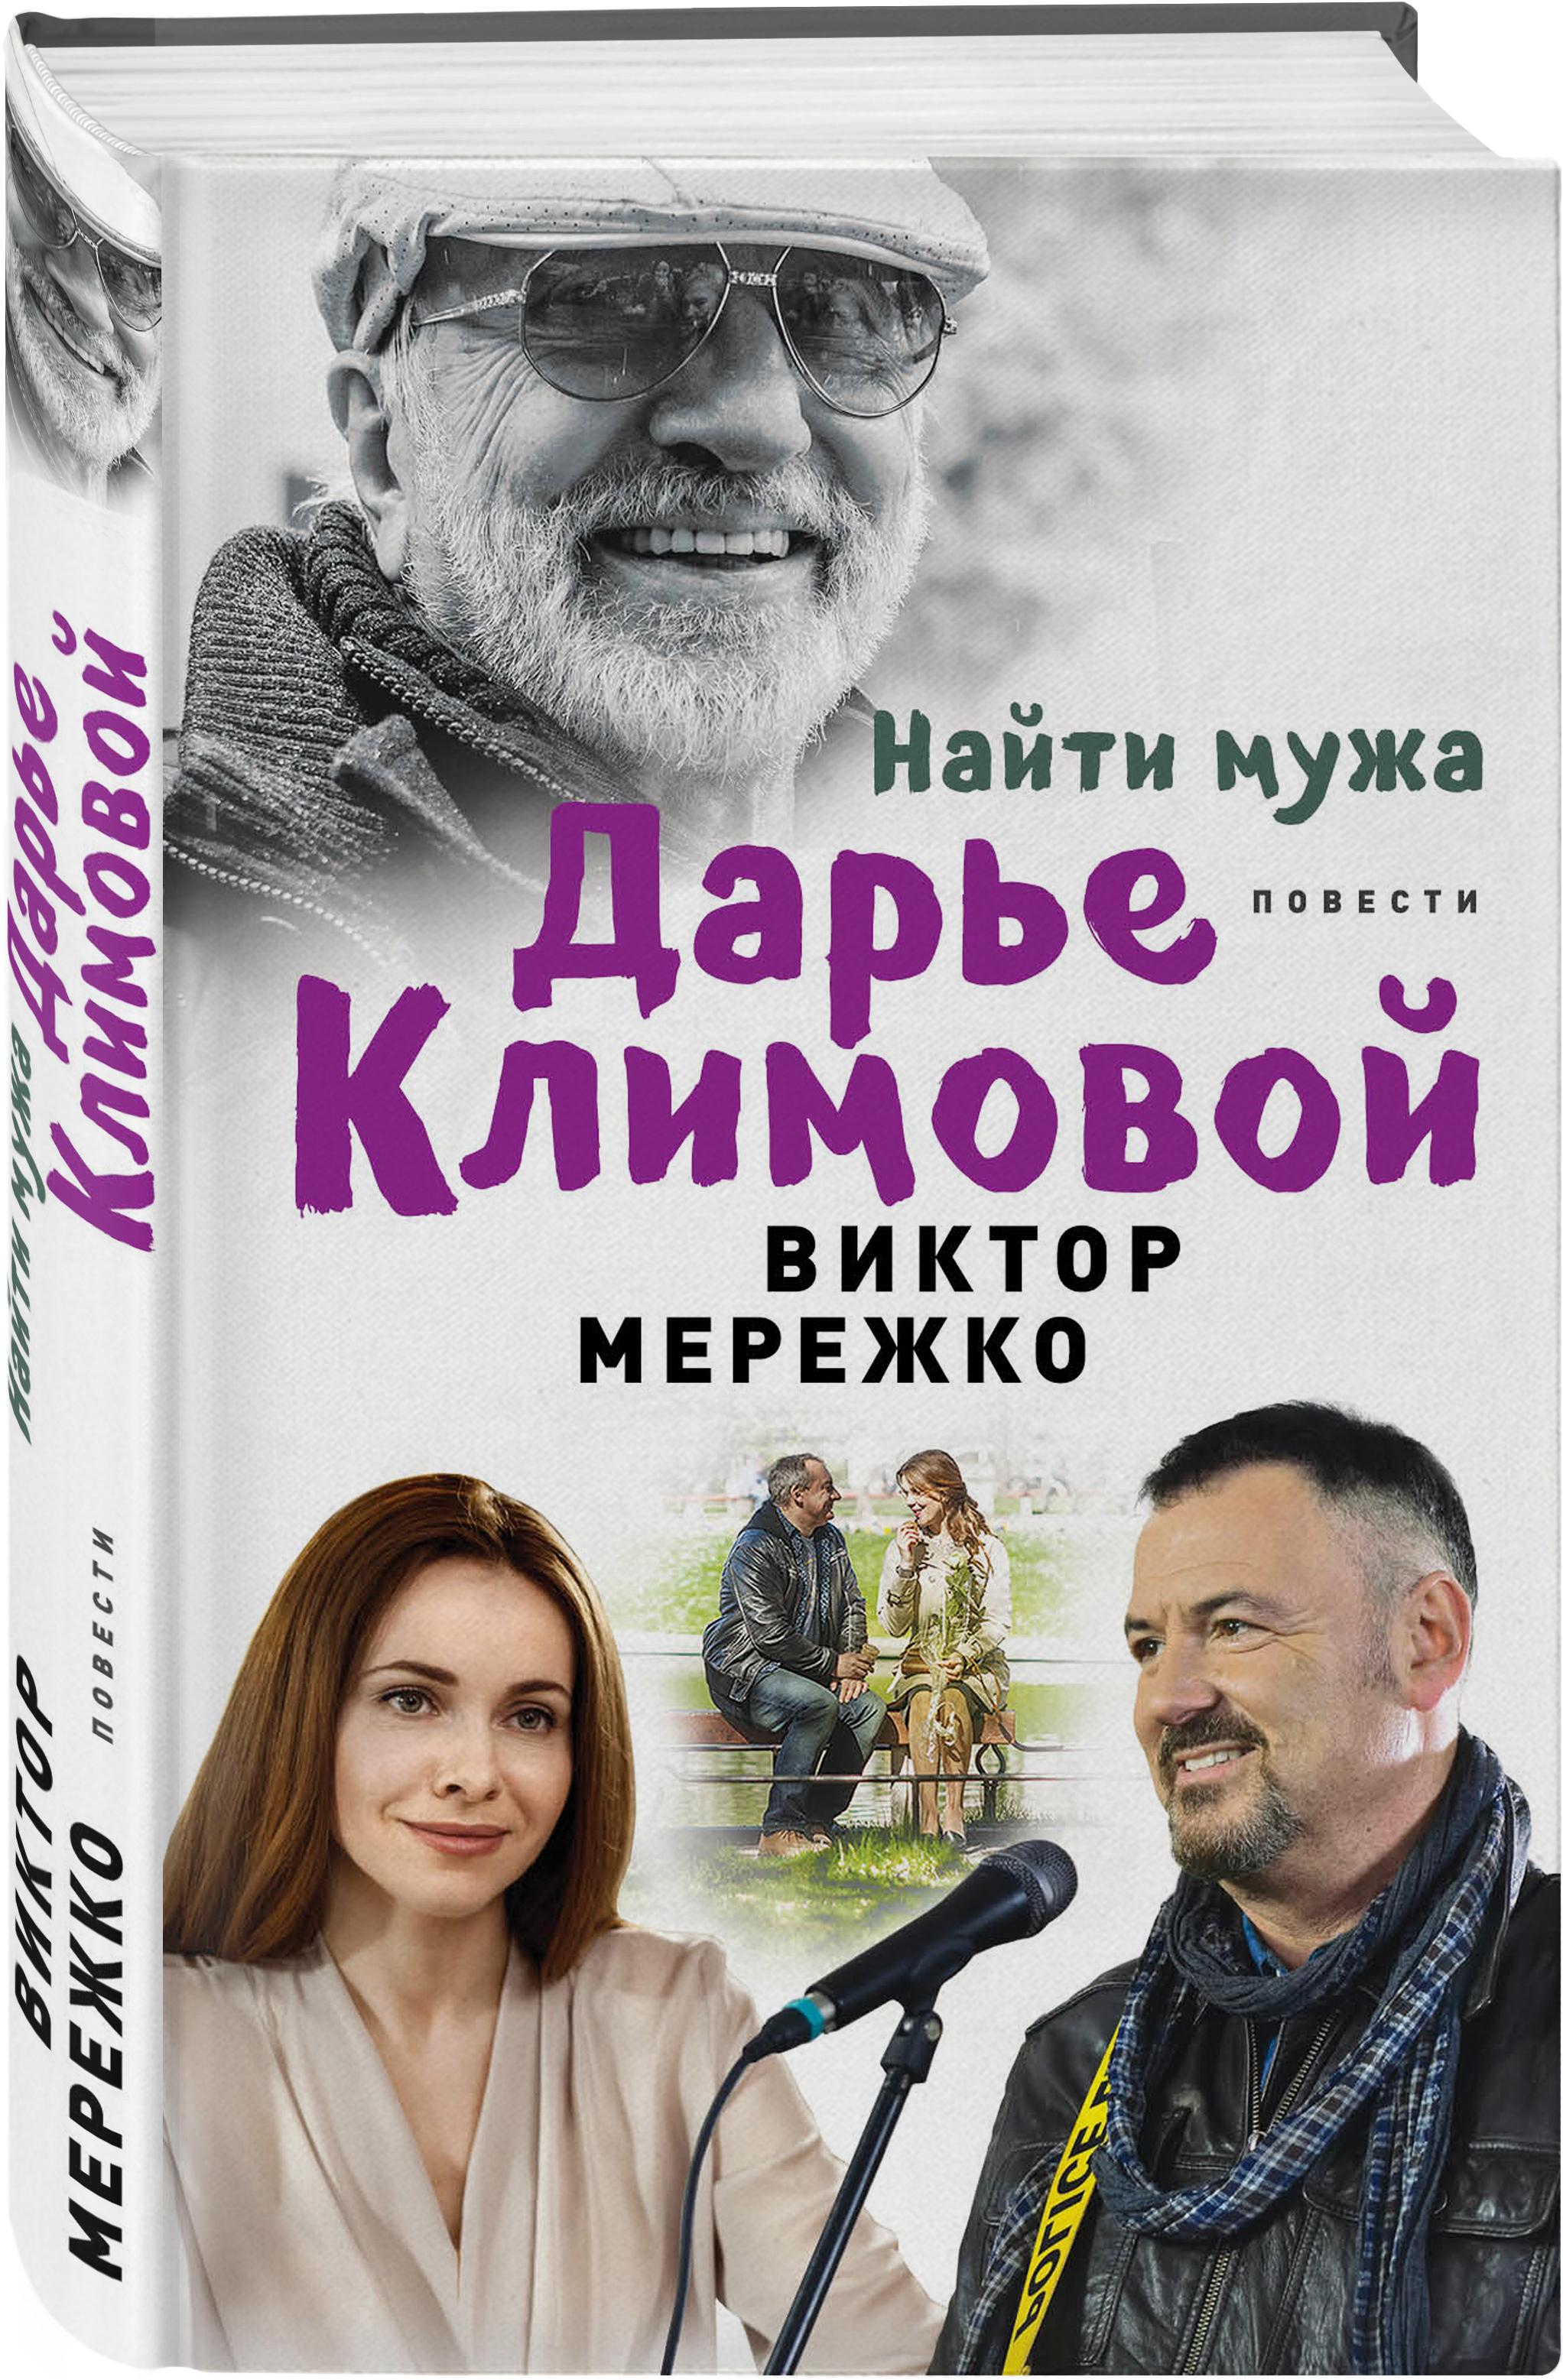 Виктор Мережко Найти мужа Дарье Климовой виктор мережко найти мужа дарье климовой сборник